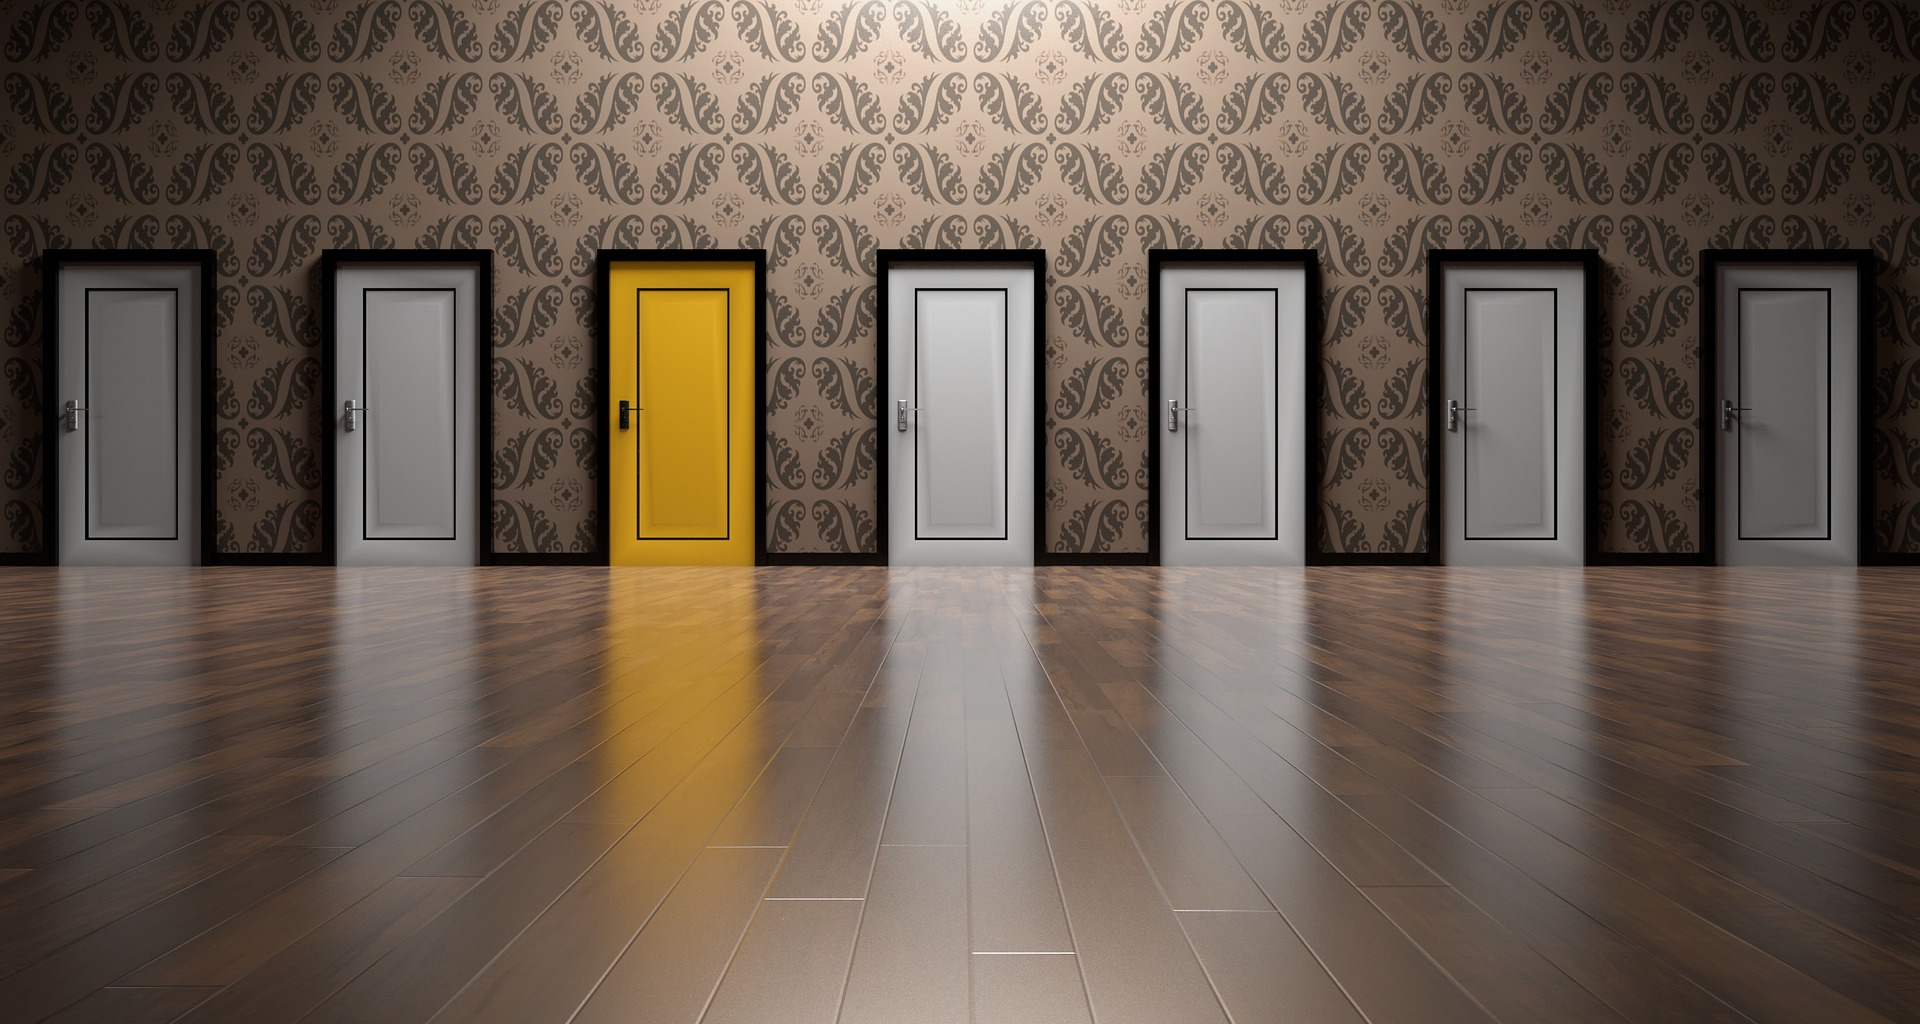 Creating a spiritual Vision / erschaffe eine spirituelle Vision